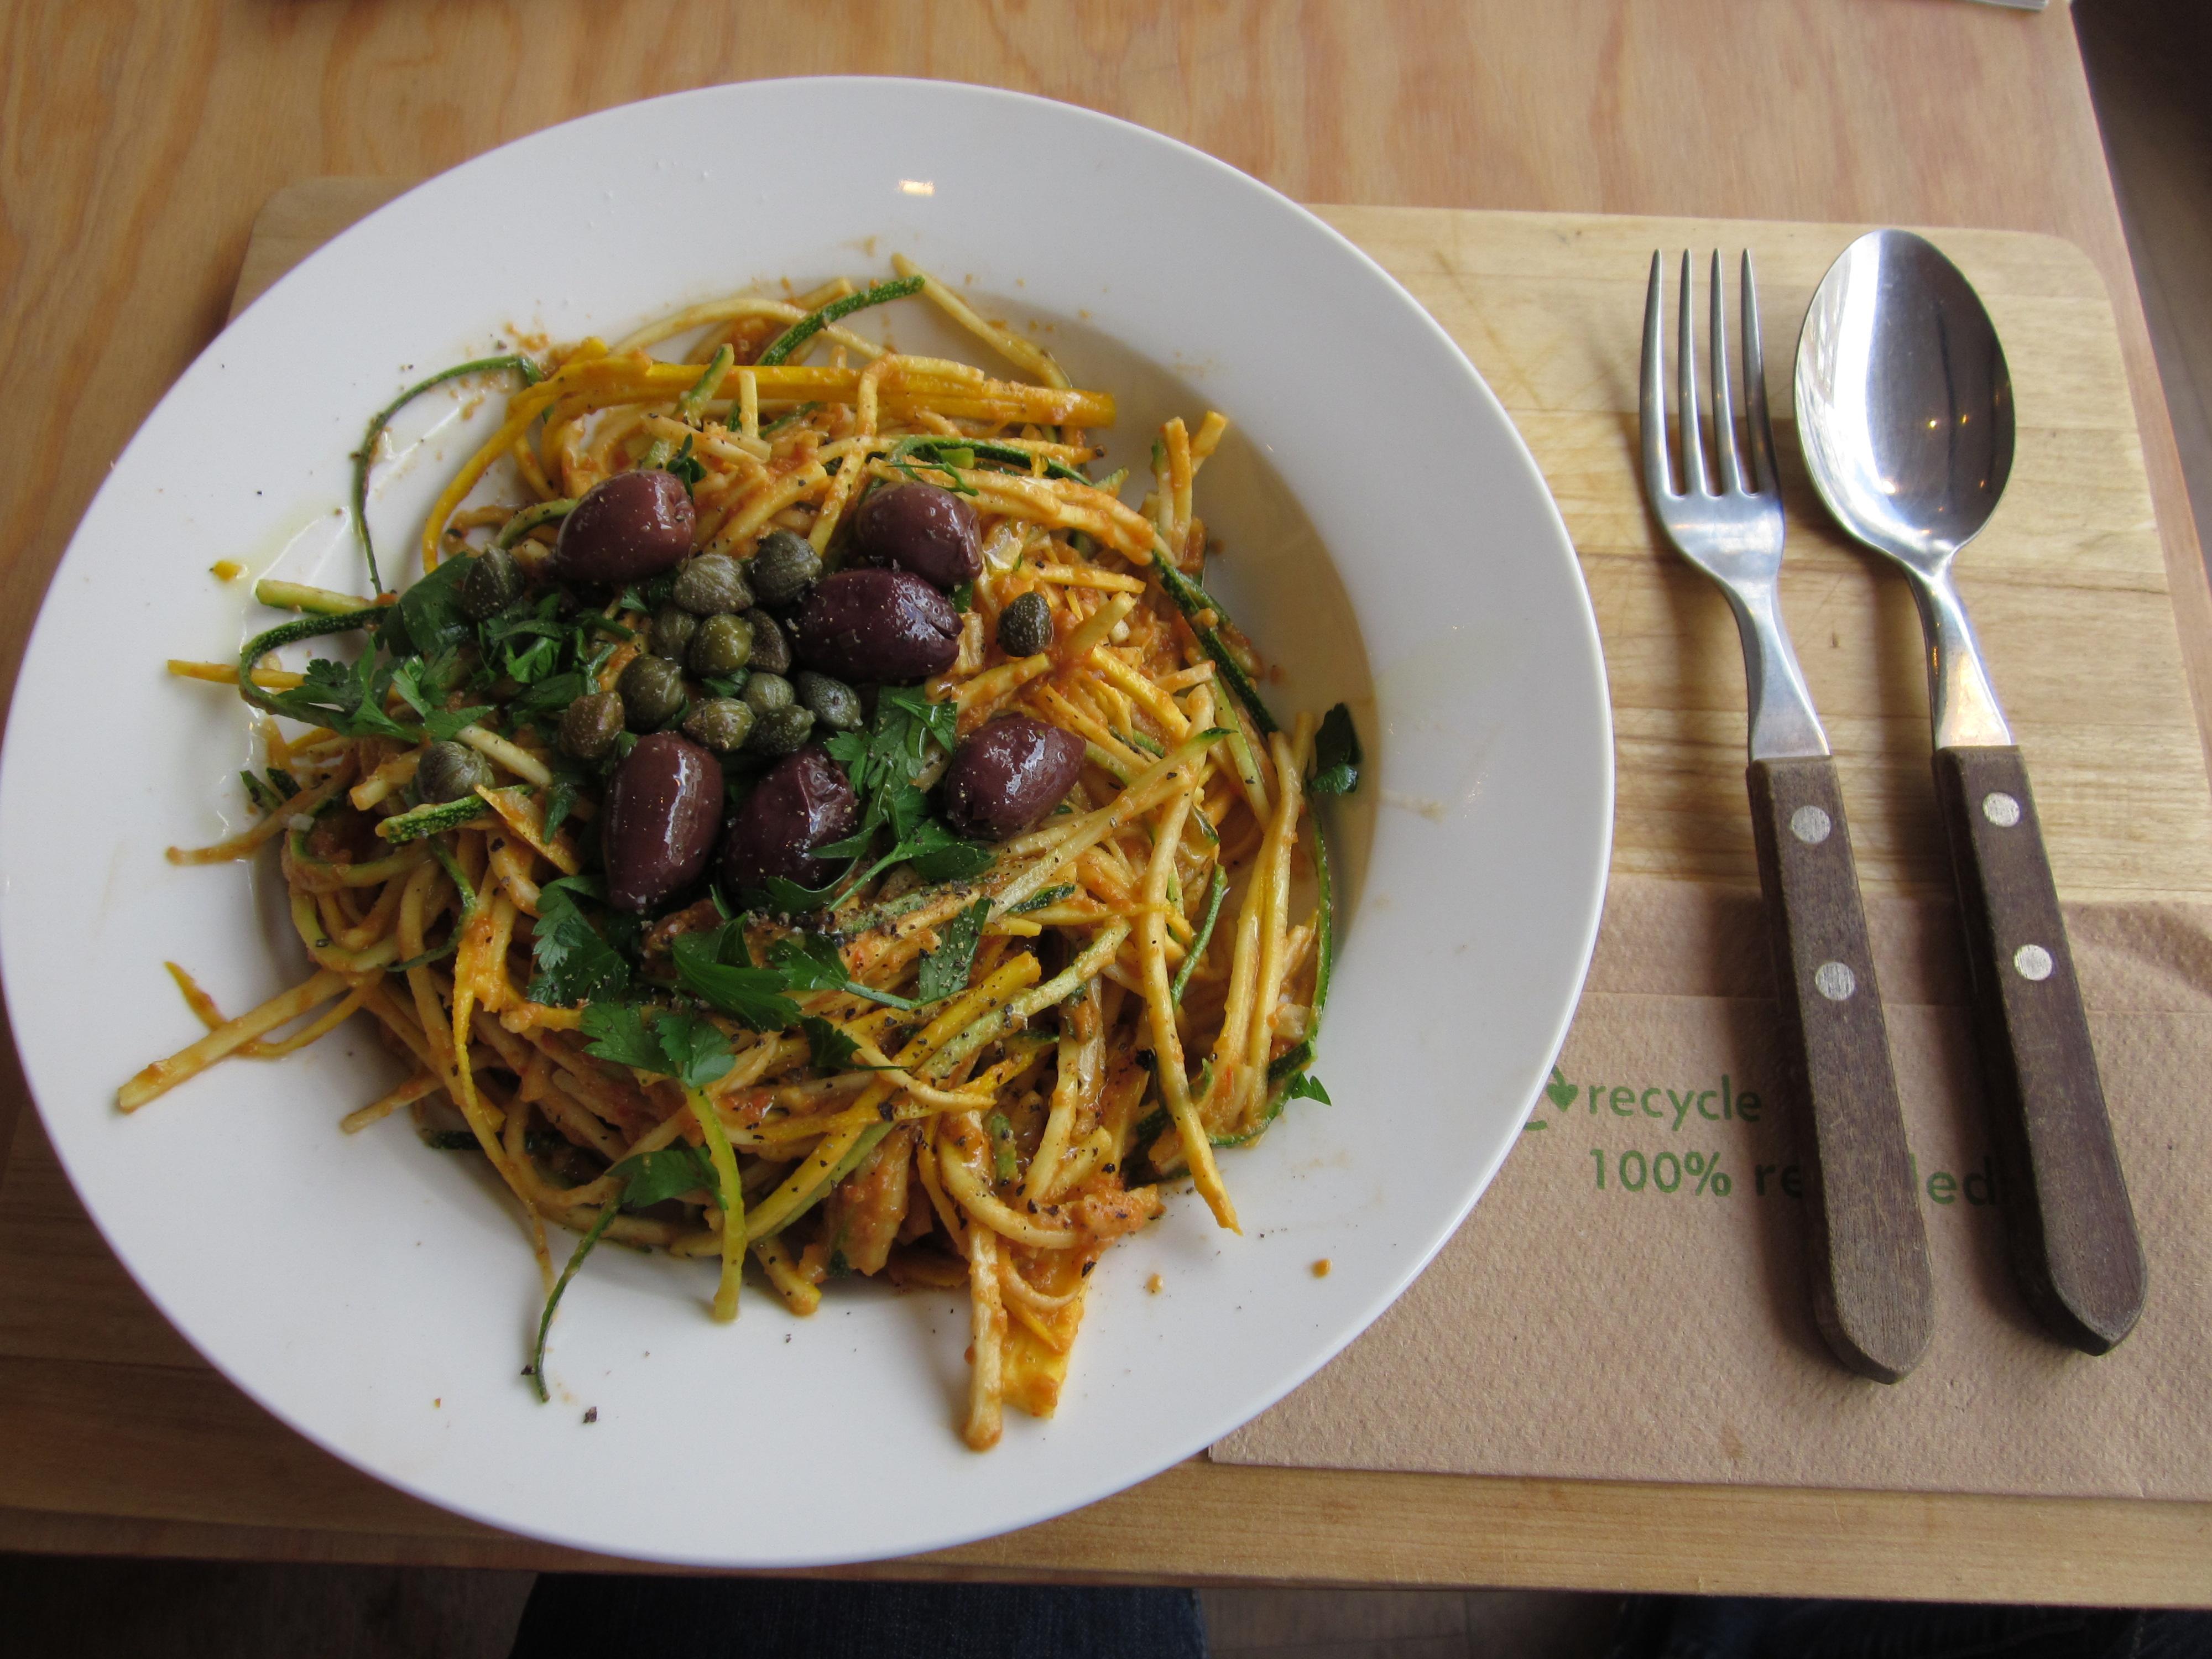 File:Zucchini-spaghetti-raw-food-antwerp.JPG